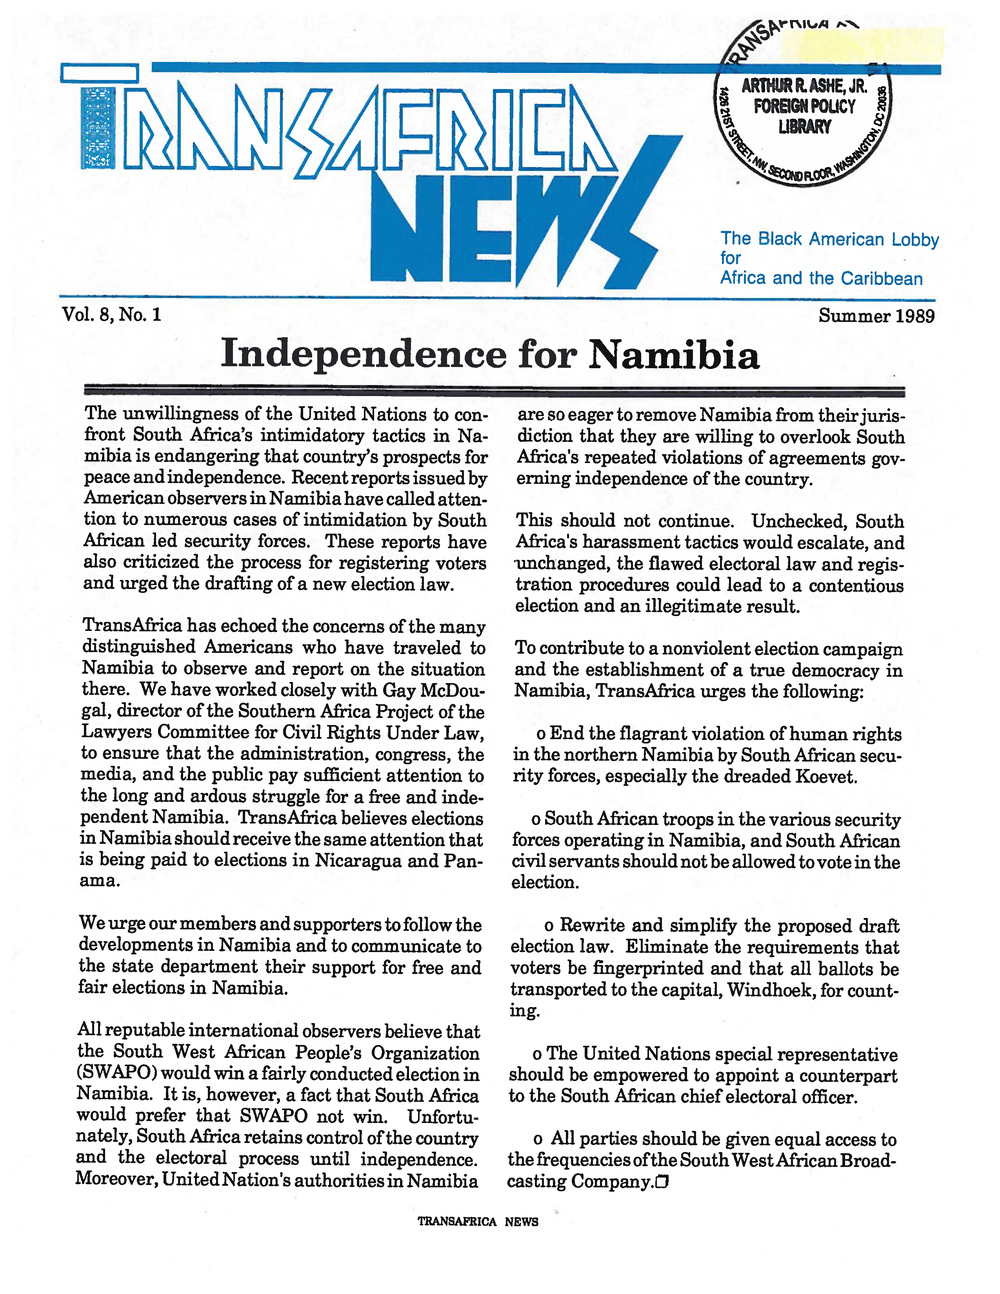 TransAfrica News Vol. 8, No. 1